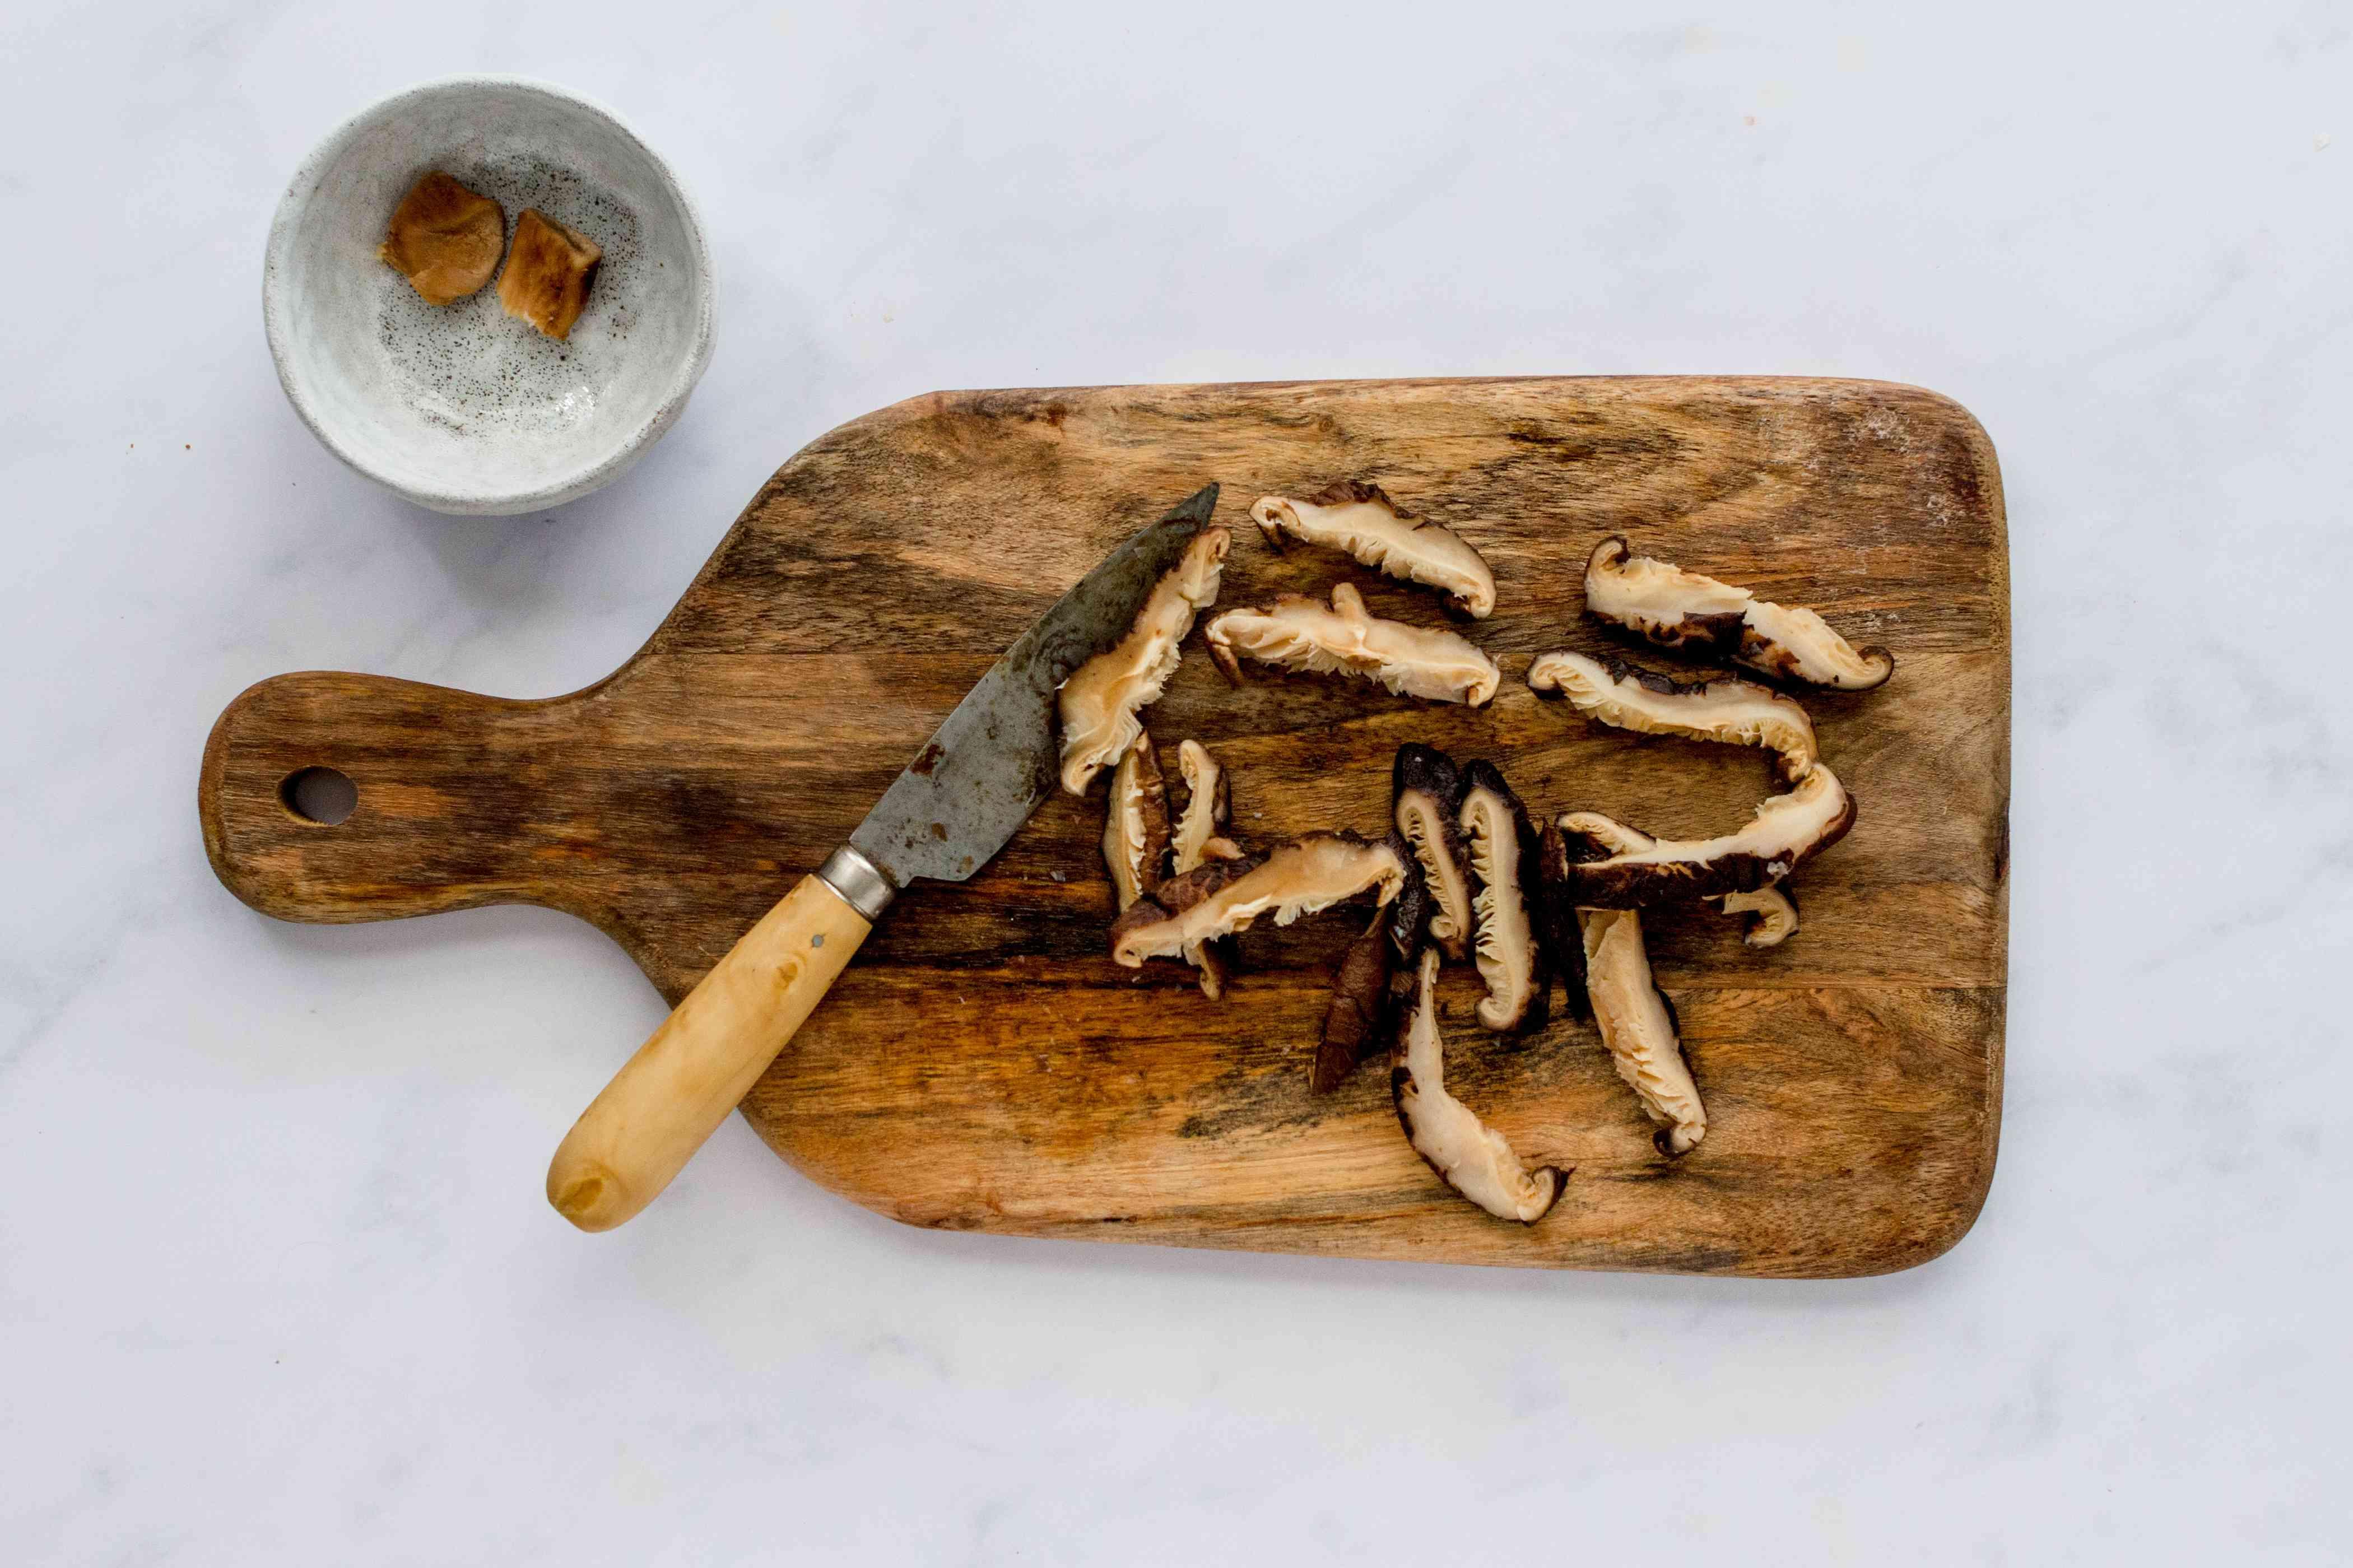 drain and slice mushrooms